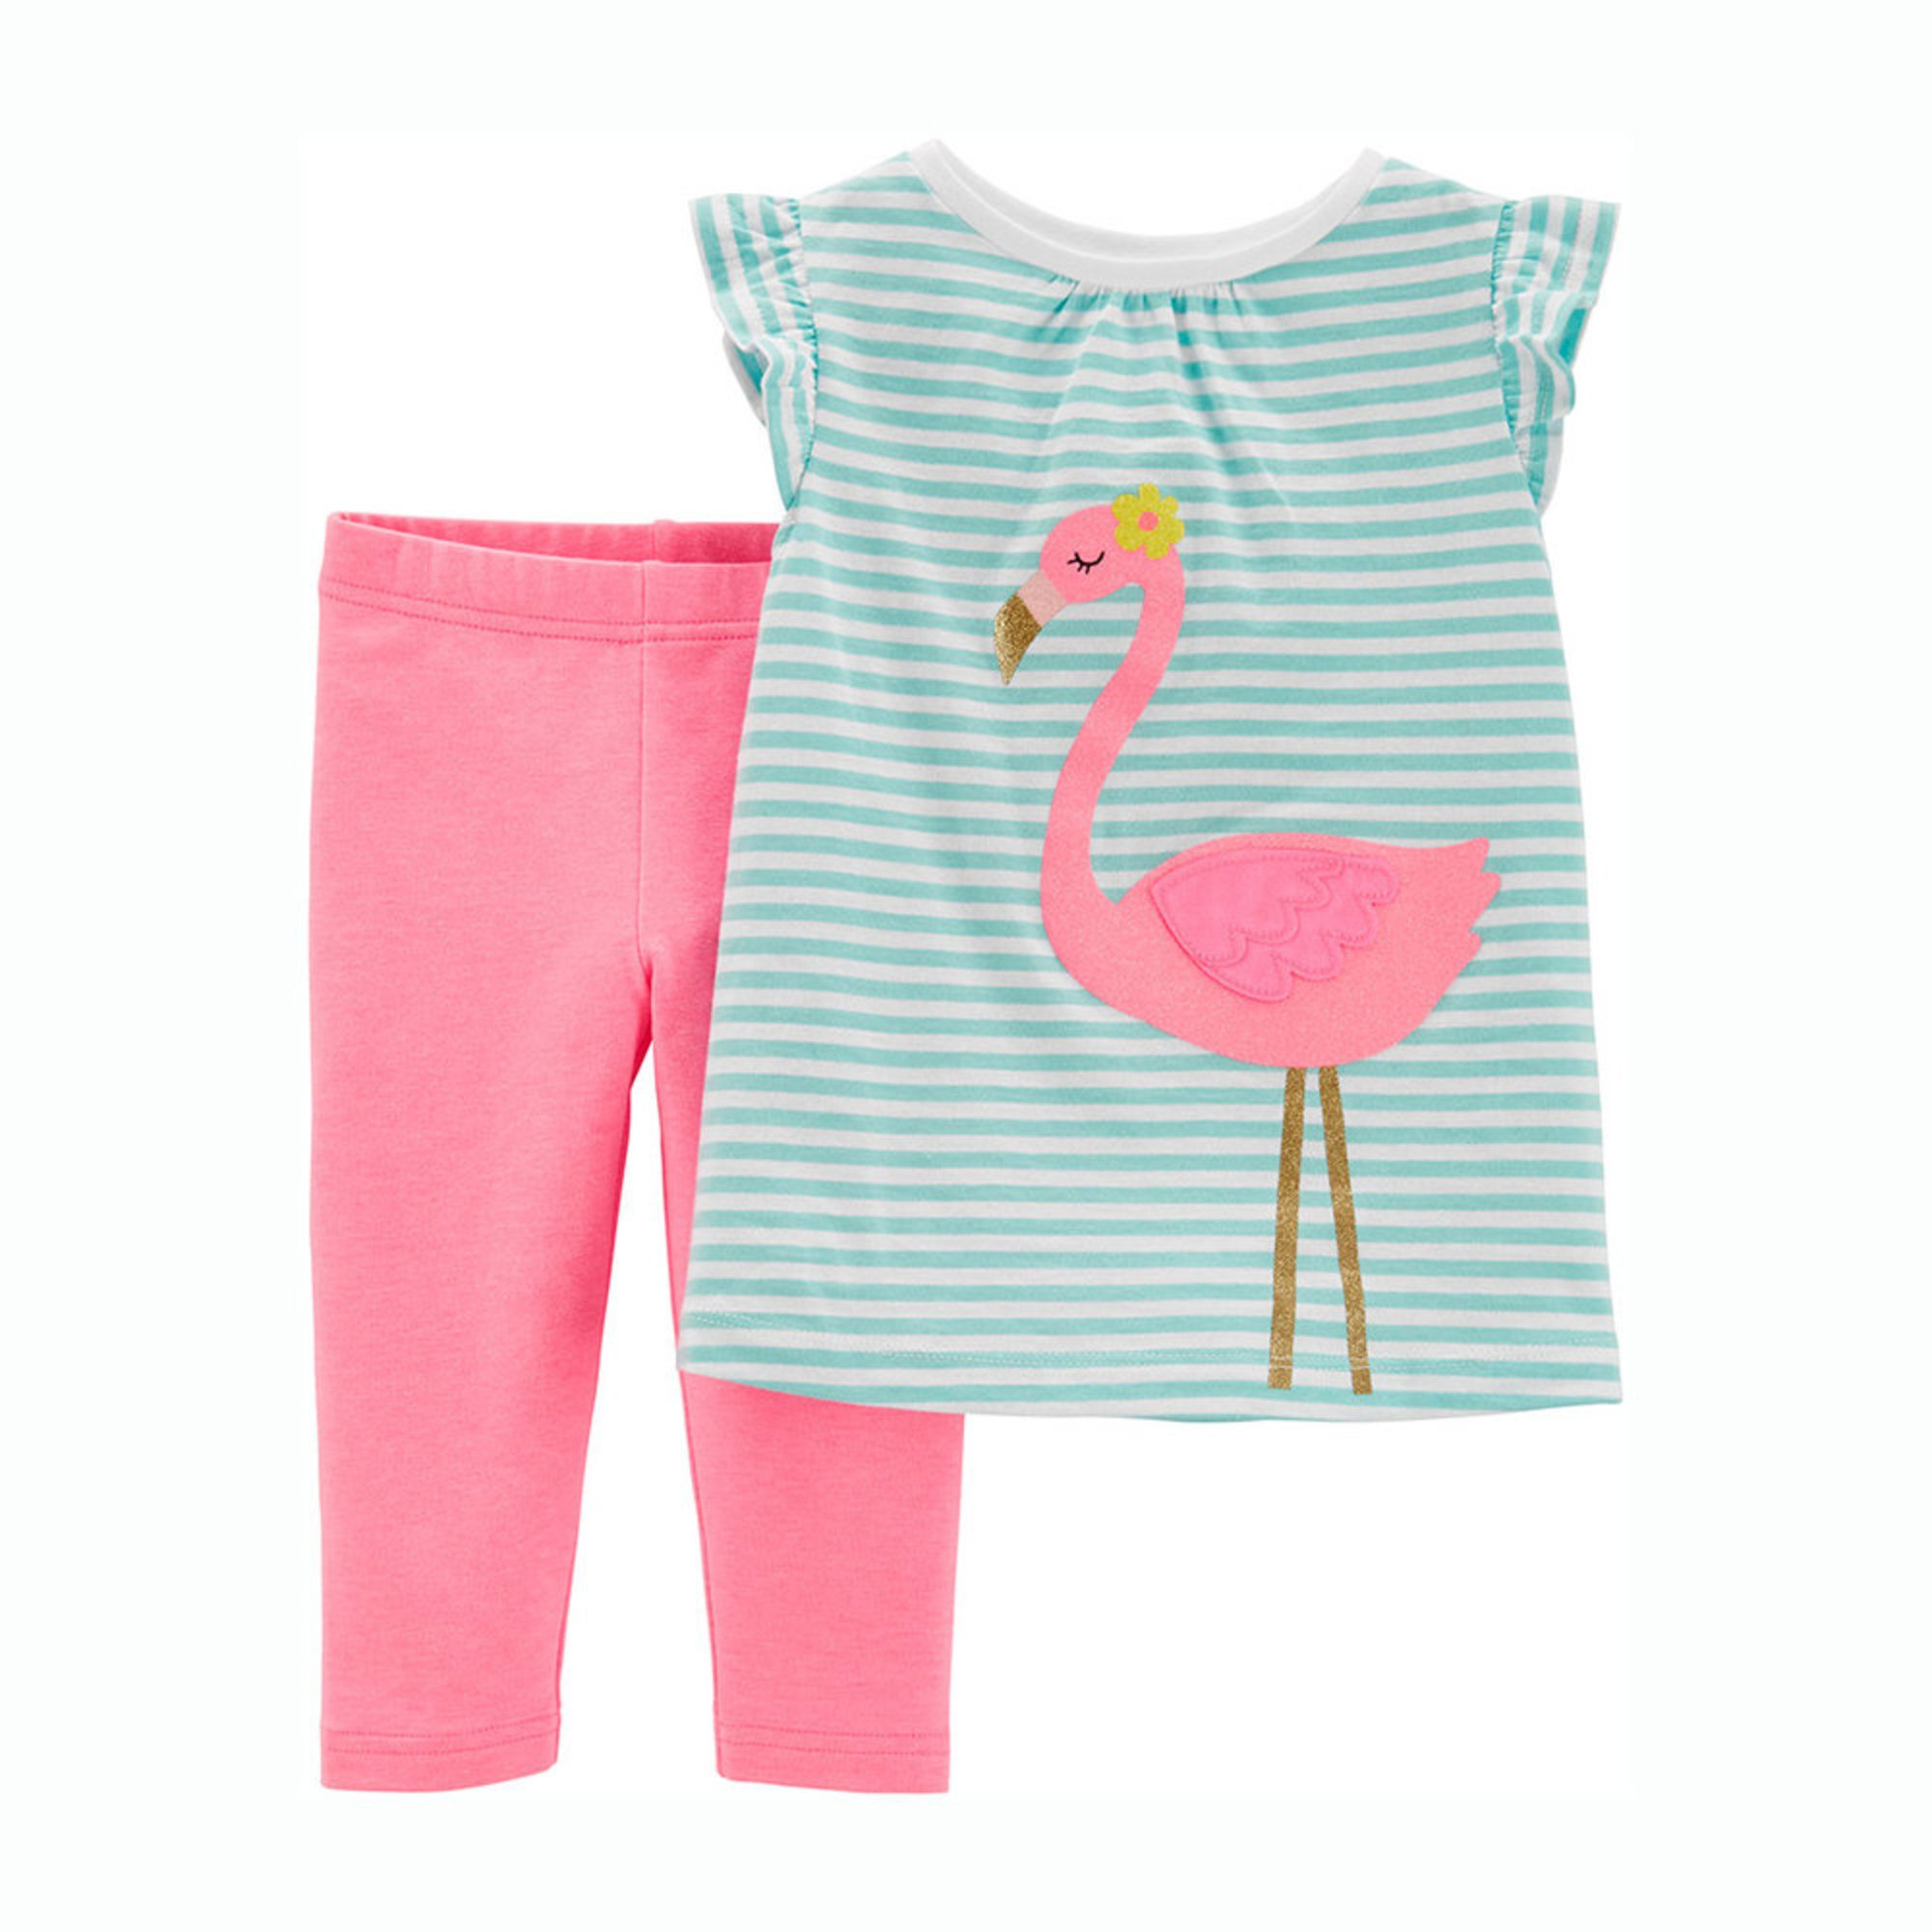 b543826f8ca51 Carter's Toddler Girls' 2-piece Flamingo Knit Legging Set | Little ...